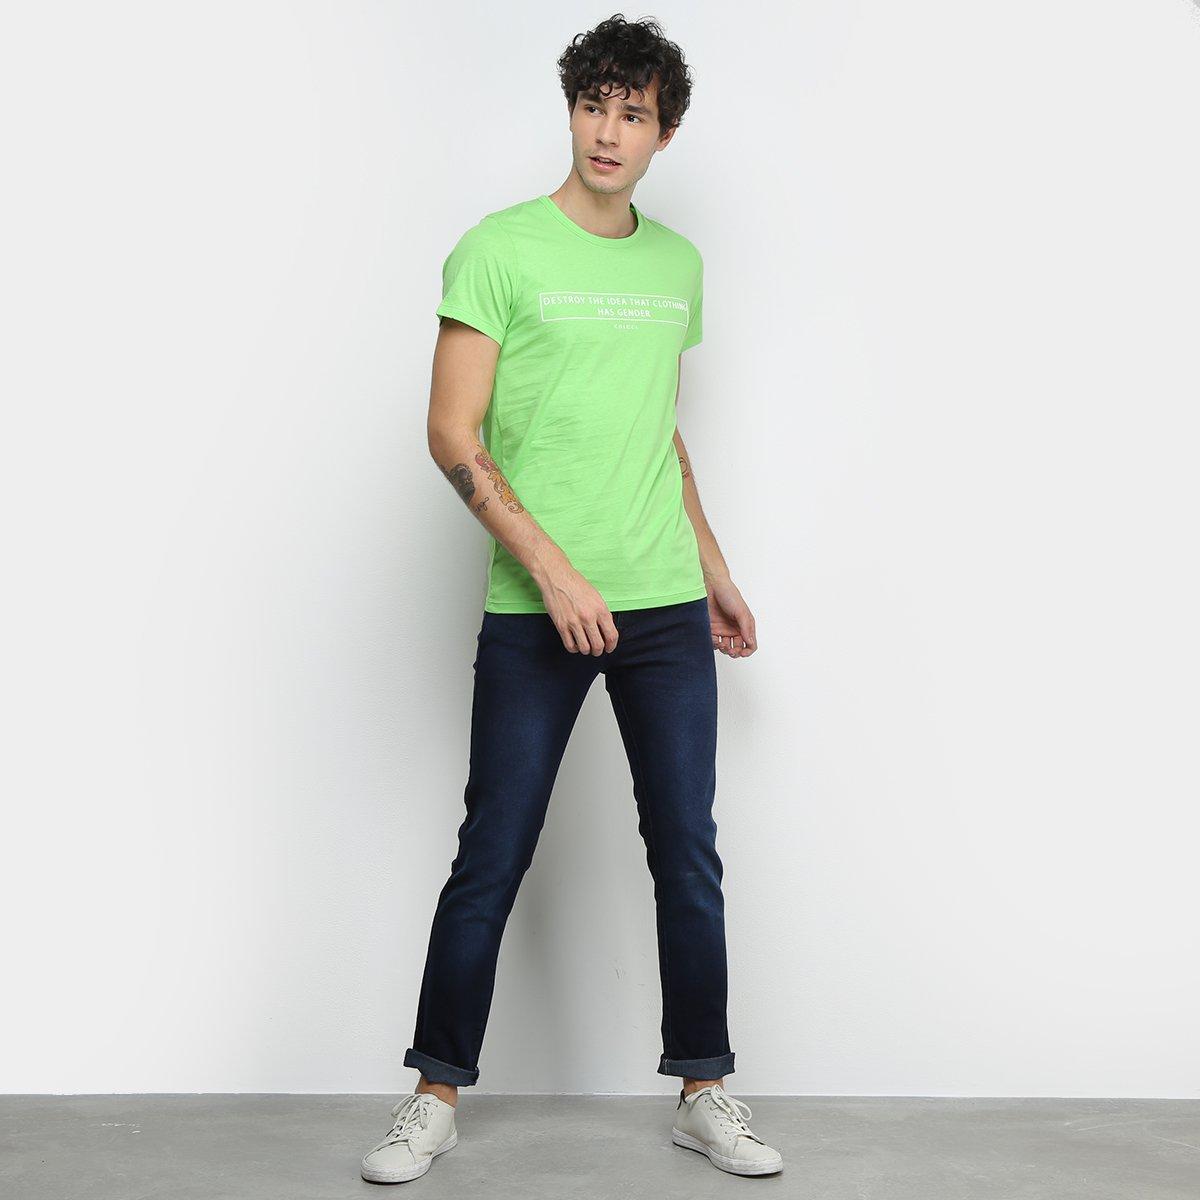 Camiseta Colcci Clothes Has Not Gender Masculina - Verde claro